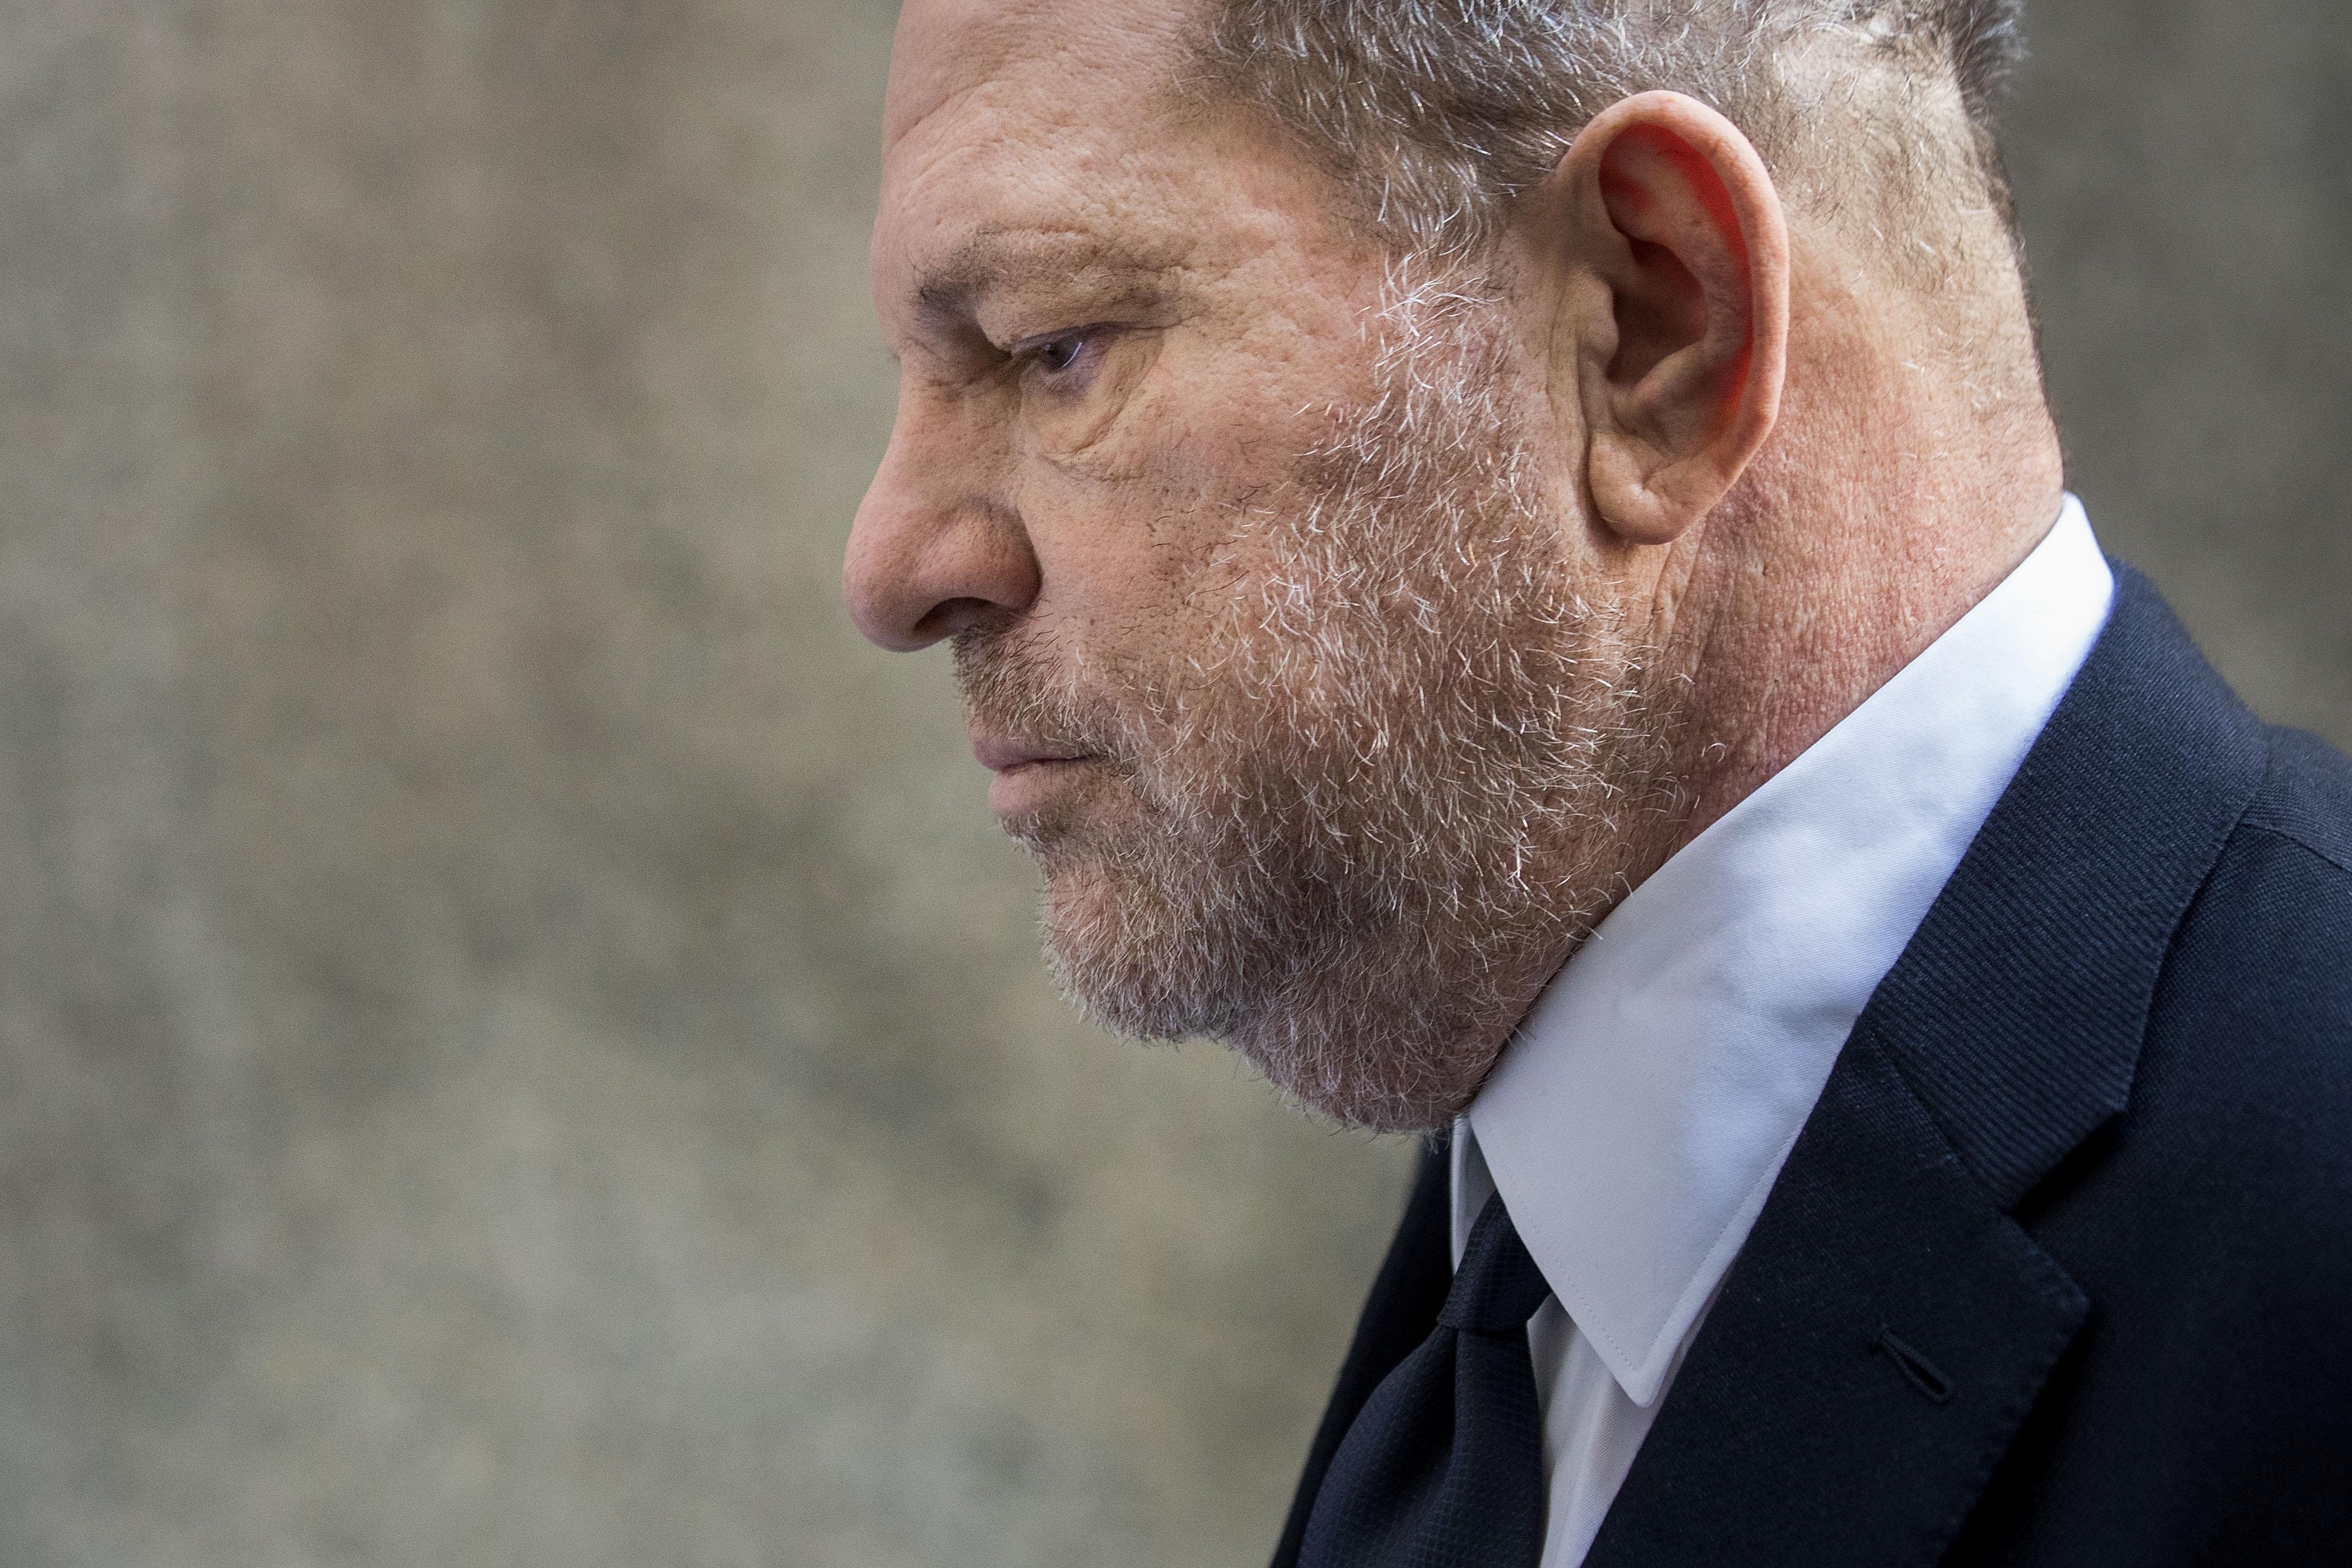 Harvey Weinstein arrives at State Supreme Court, June 5, 2018 in New York City.